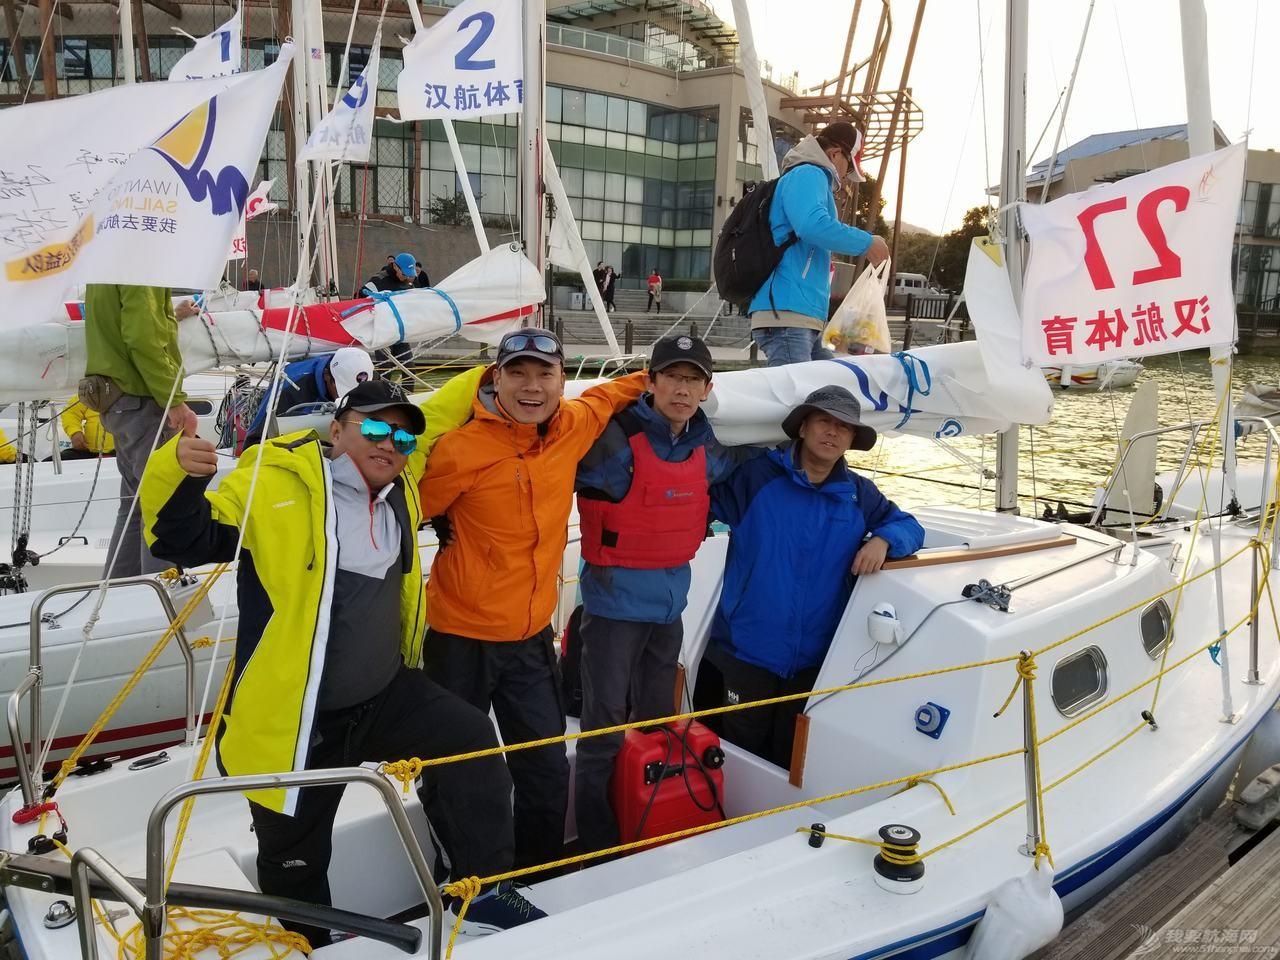 nbsp,到了,航海,我们,帆船 人生中的第一次--2017环太湖帆船赛  234016jp2zpal2k9cjy1hu